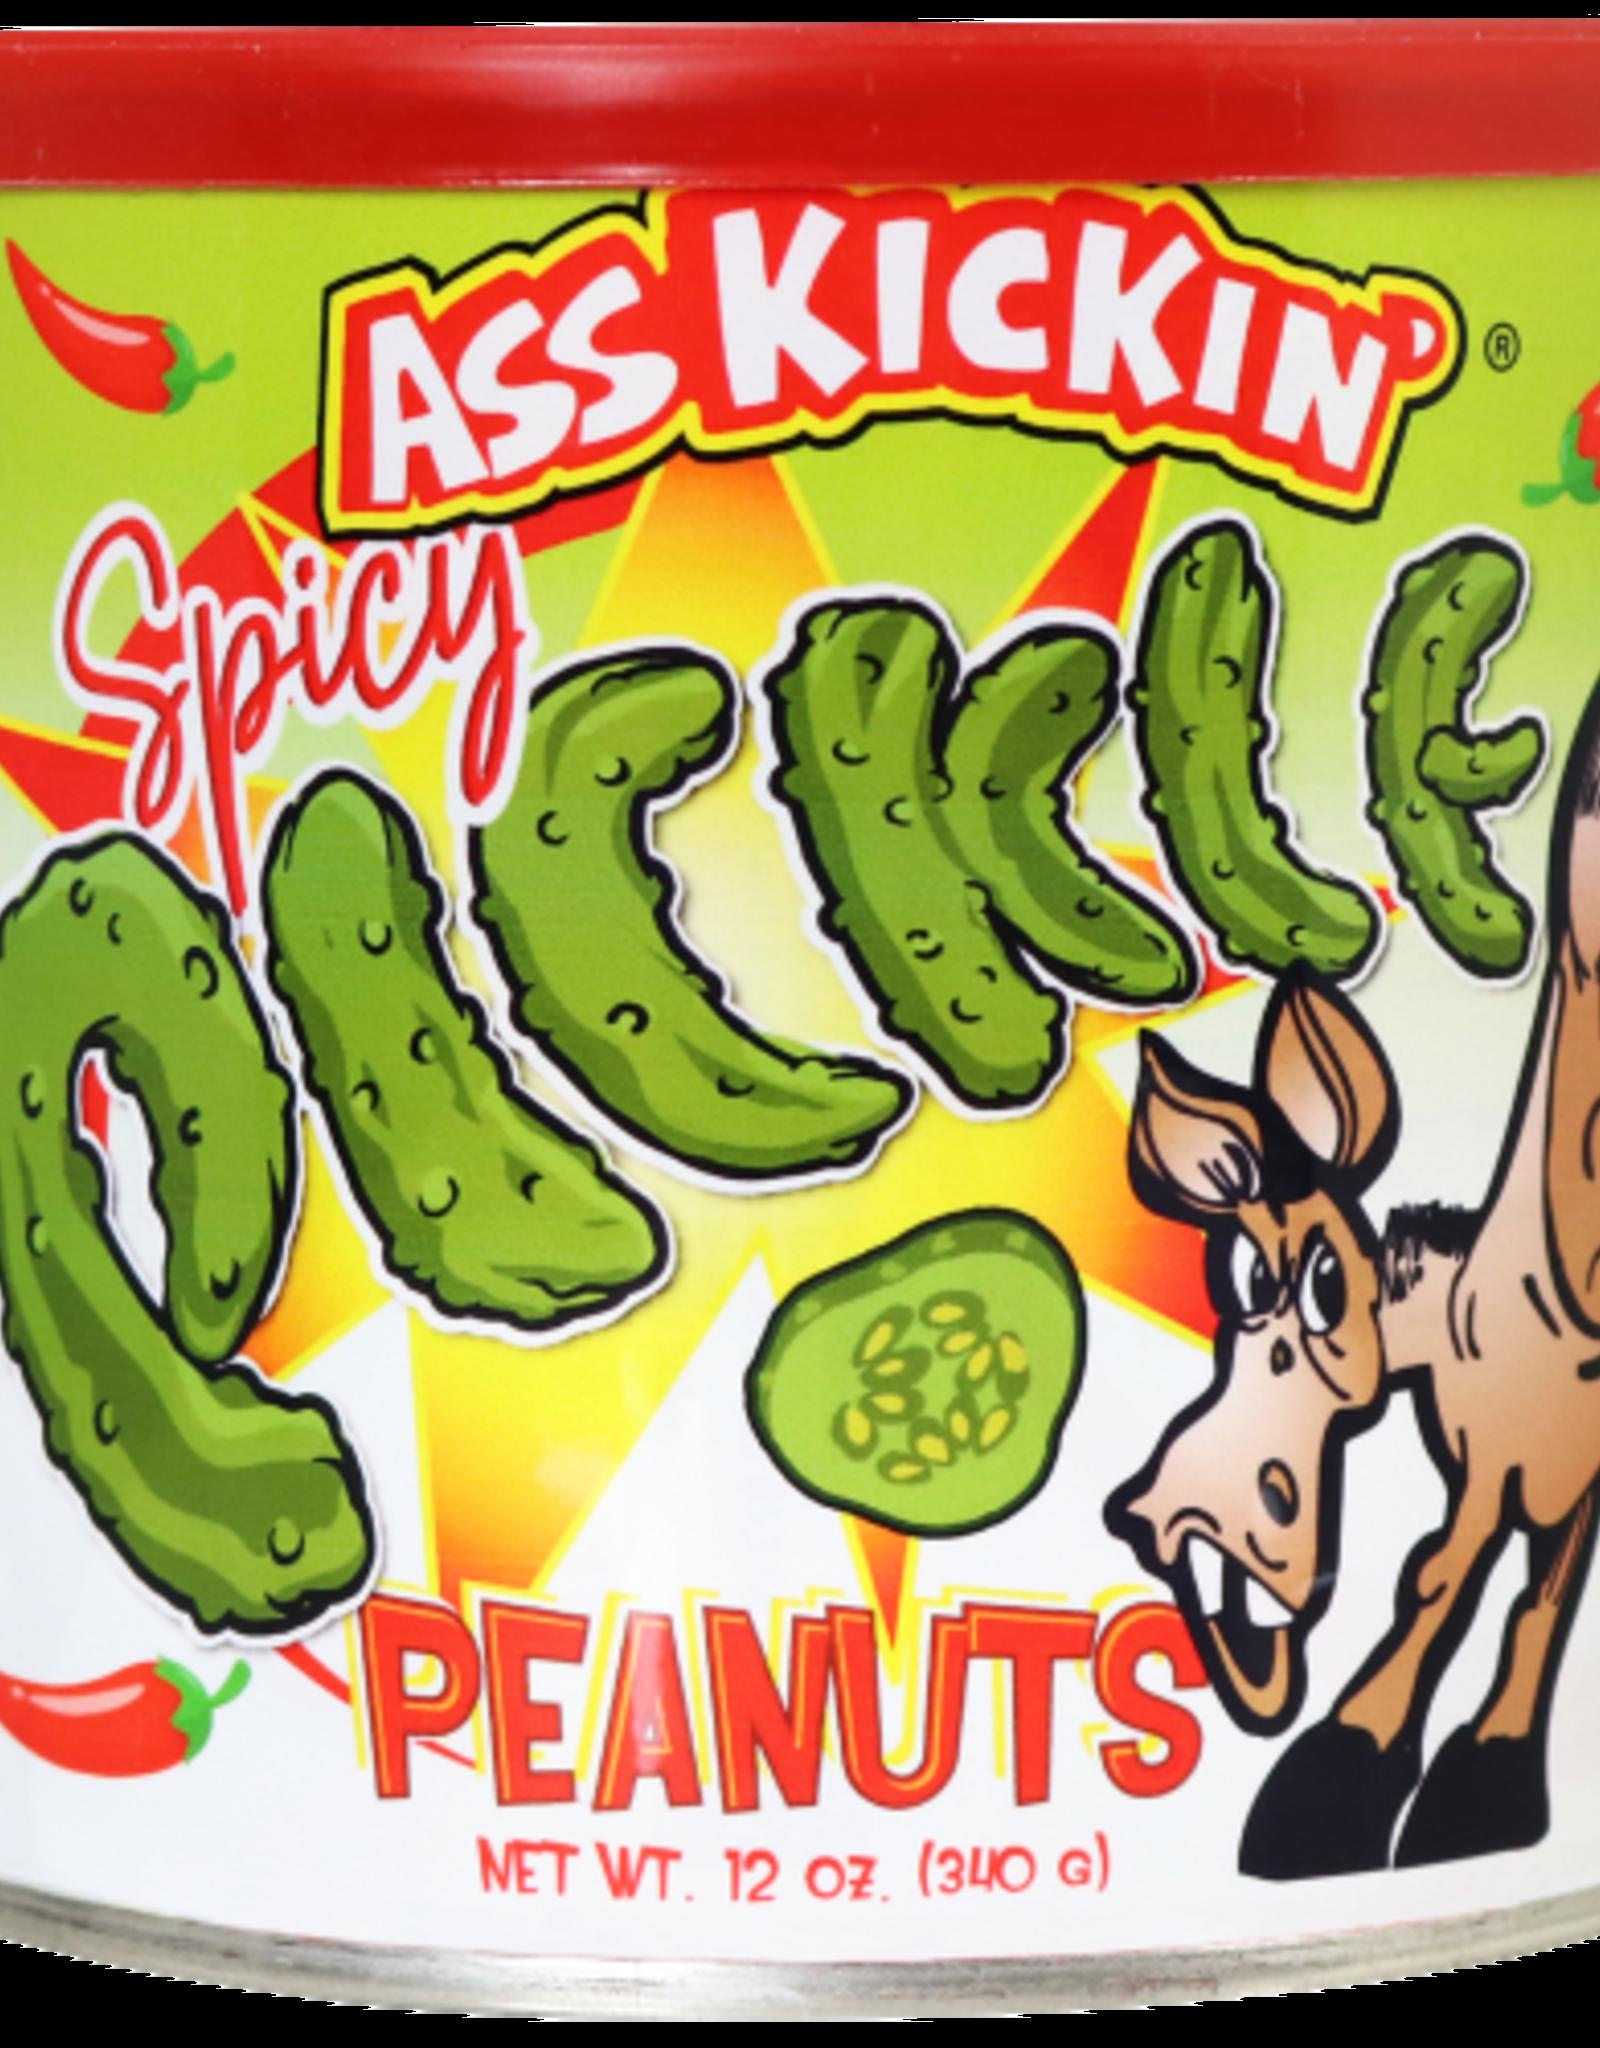 Ass kickin Ass Kickin' Spicy Pickle Peanuts